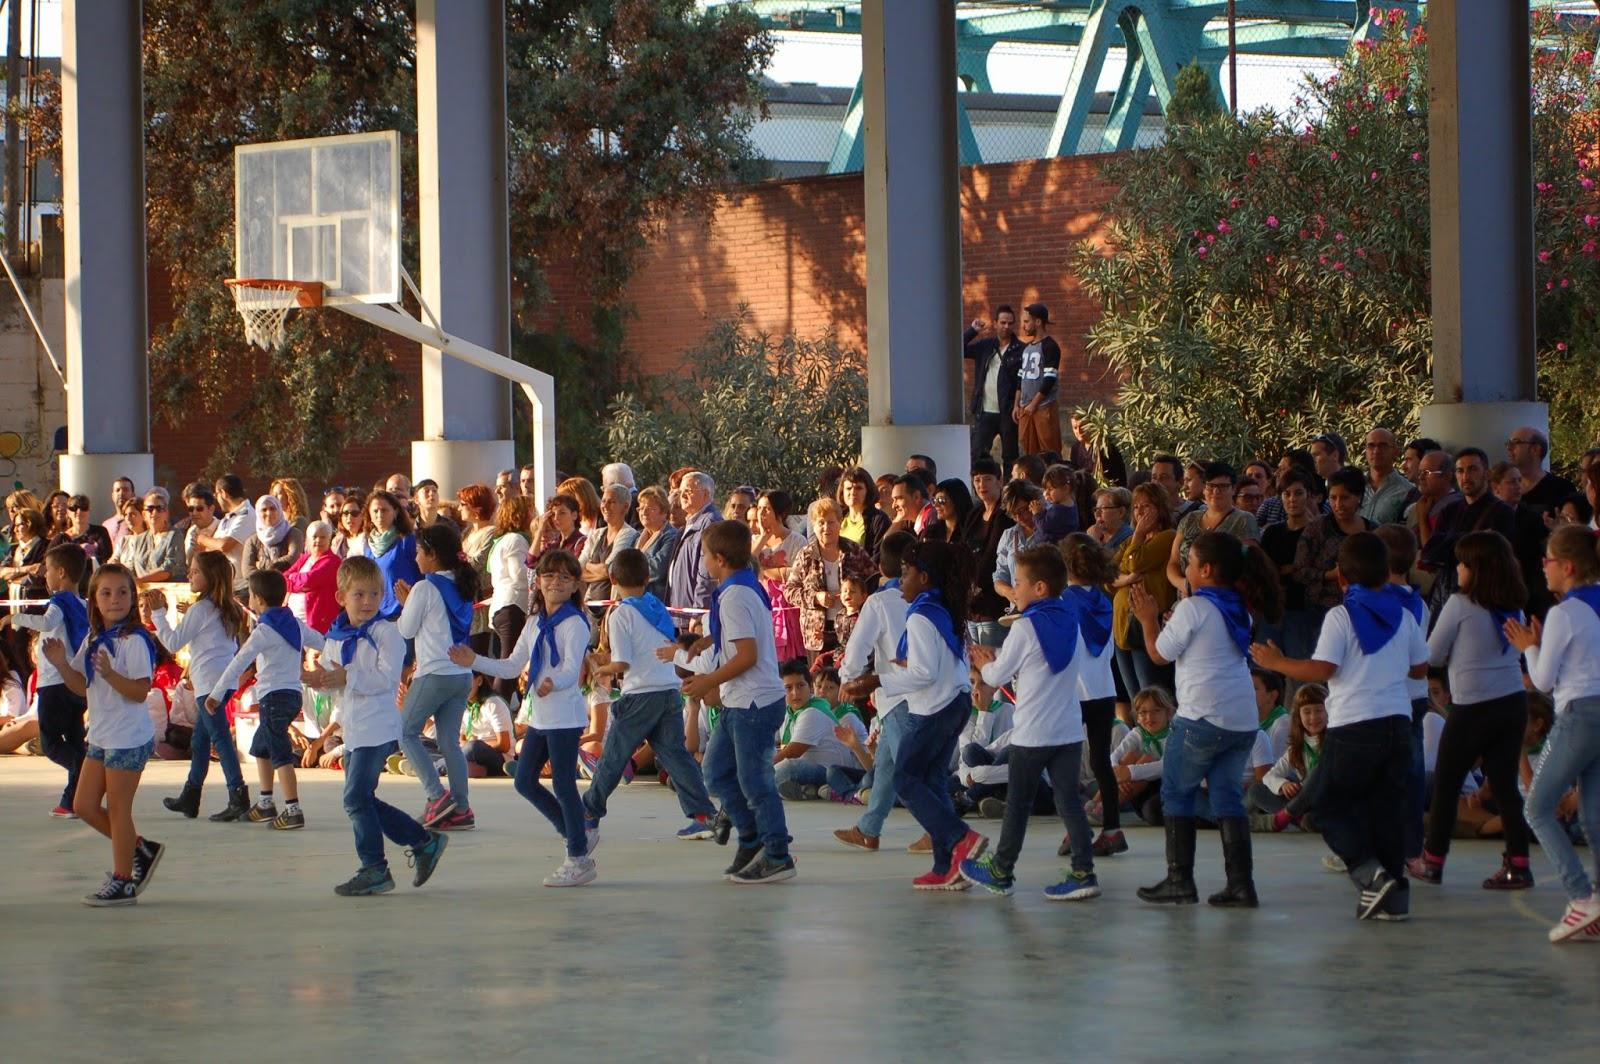 fotos de les danses 2014